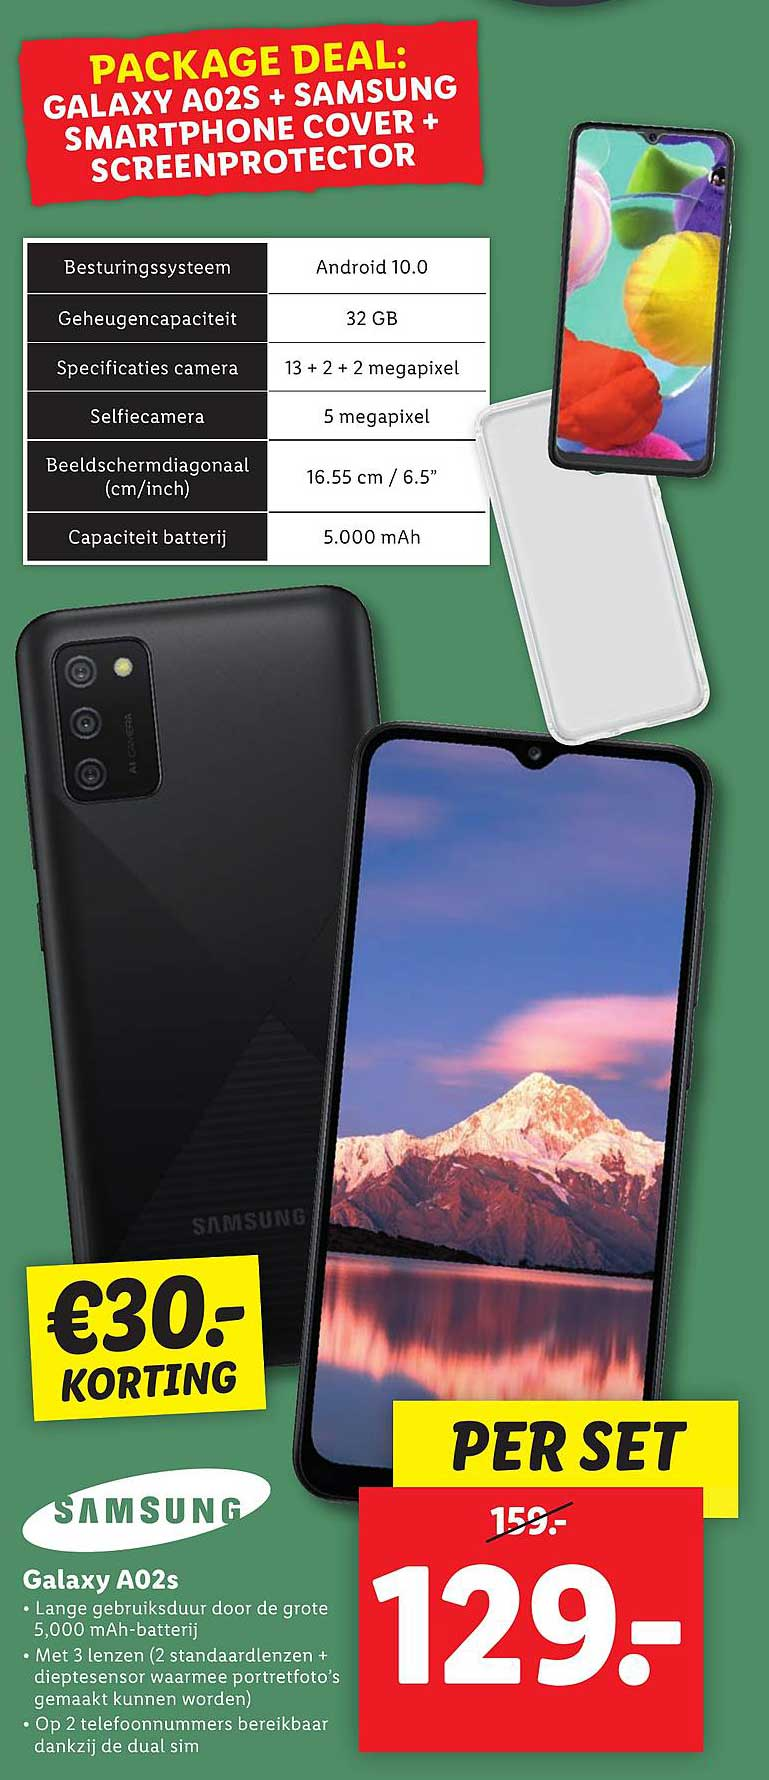 Lidl Samsung Galaxy A02s €30.- Korting